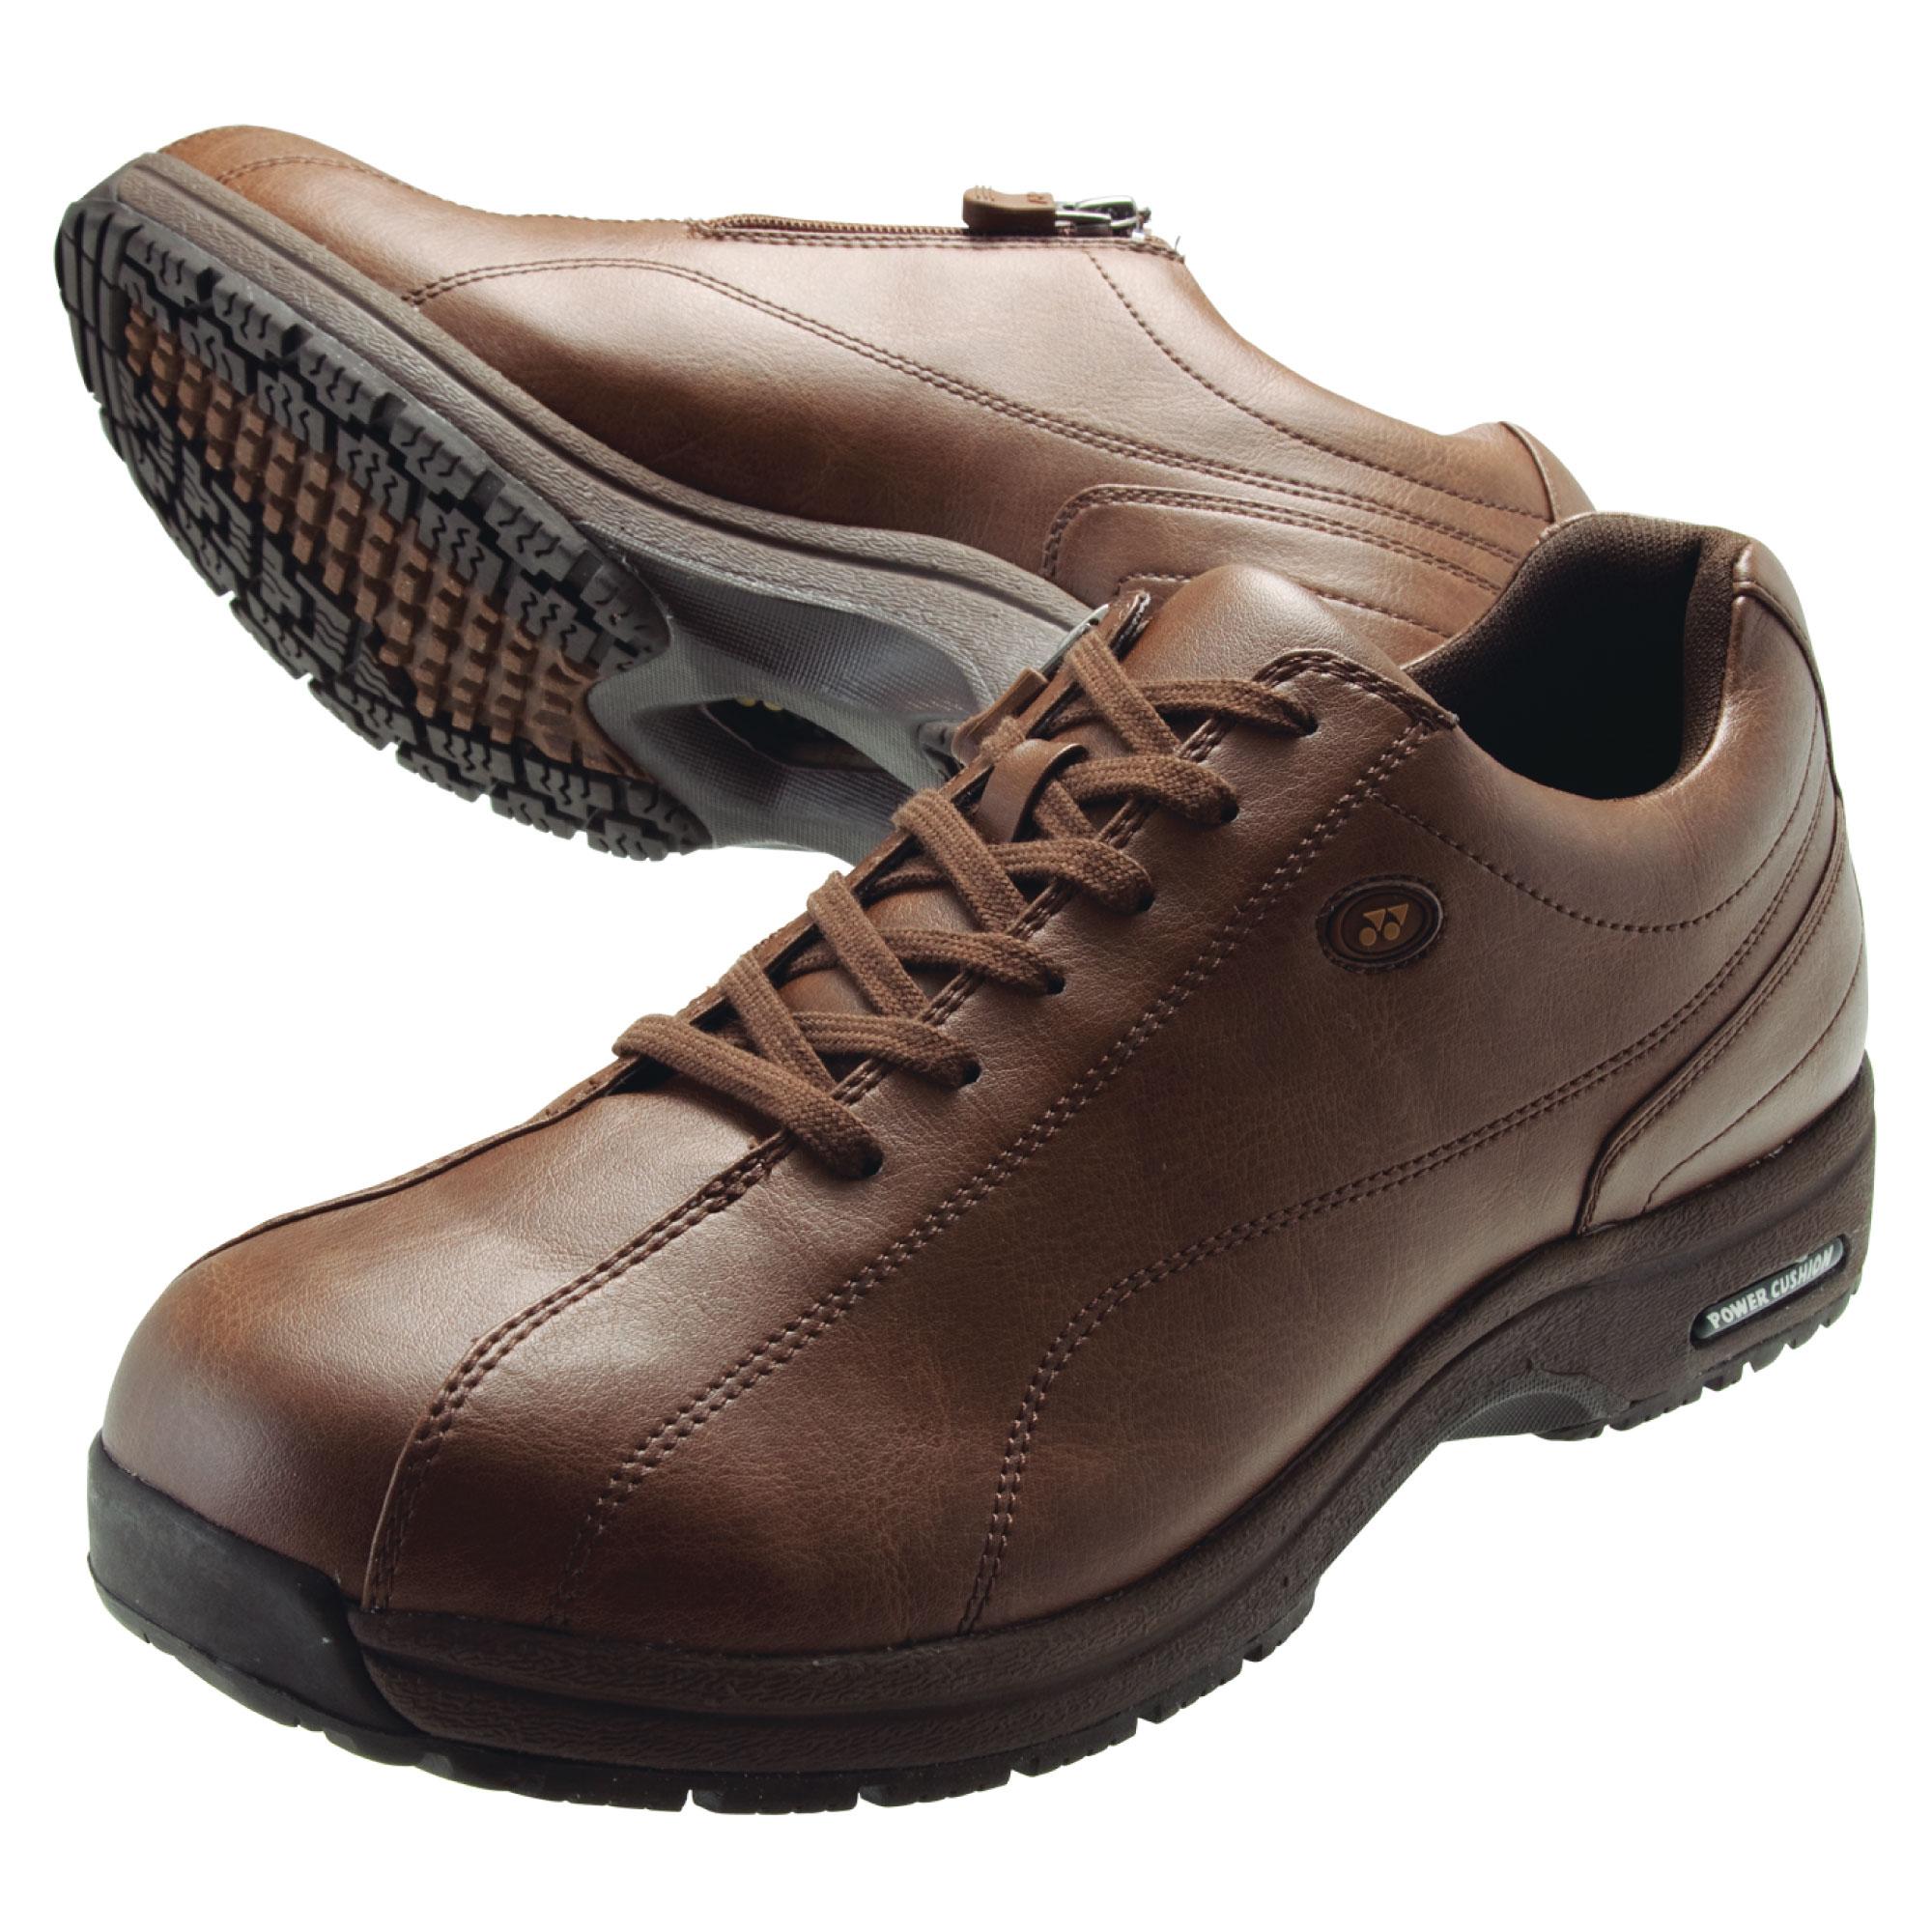 e85cef57f6bf82 MC37 | CASUAL WALK カジュアルウォーク | YONEX WALKING ヨネックス ...